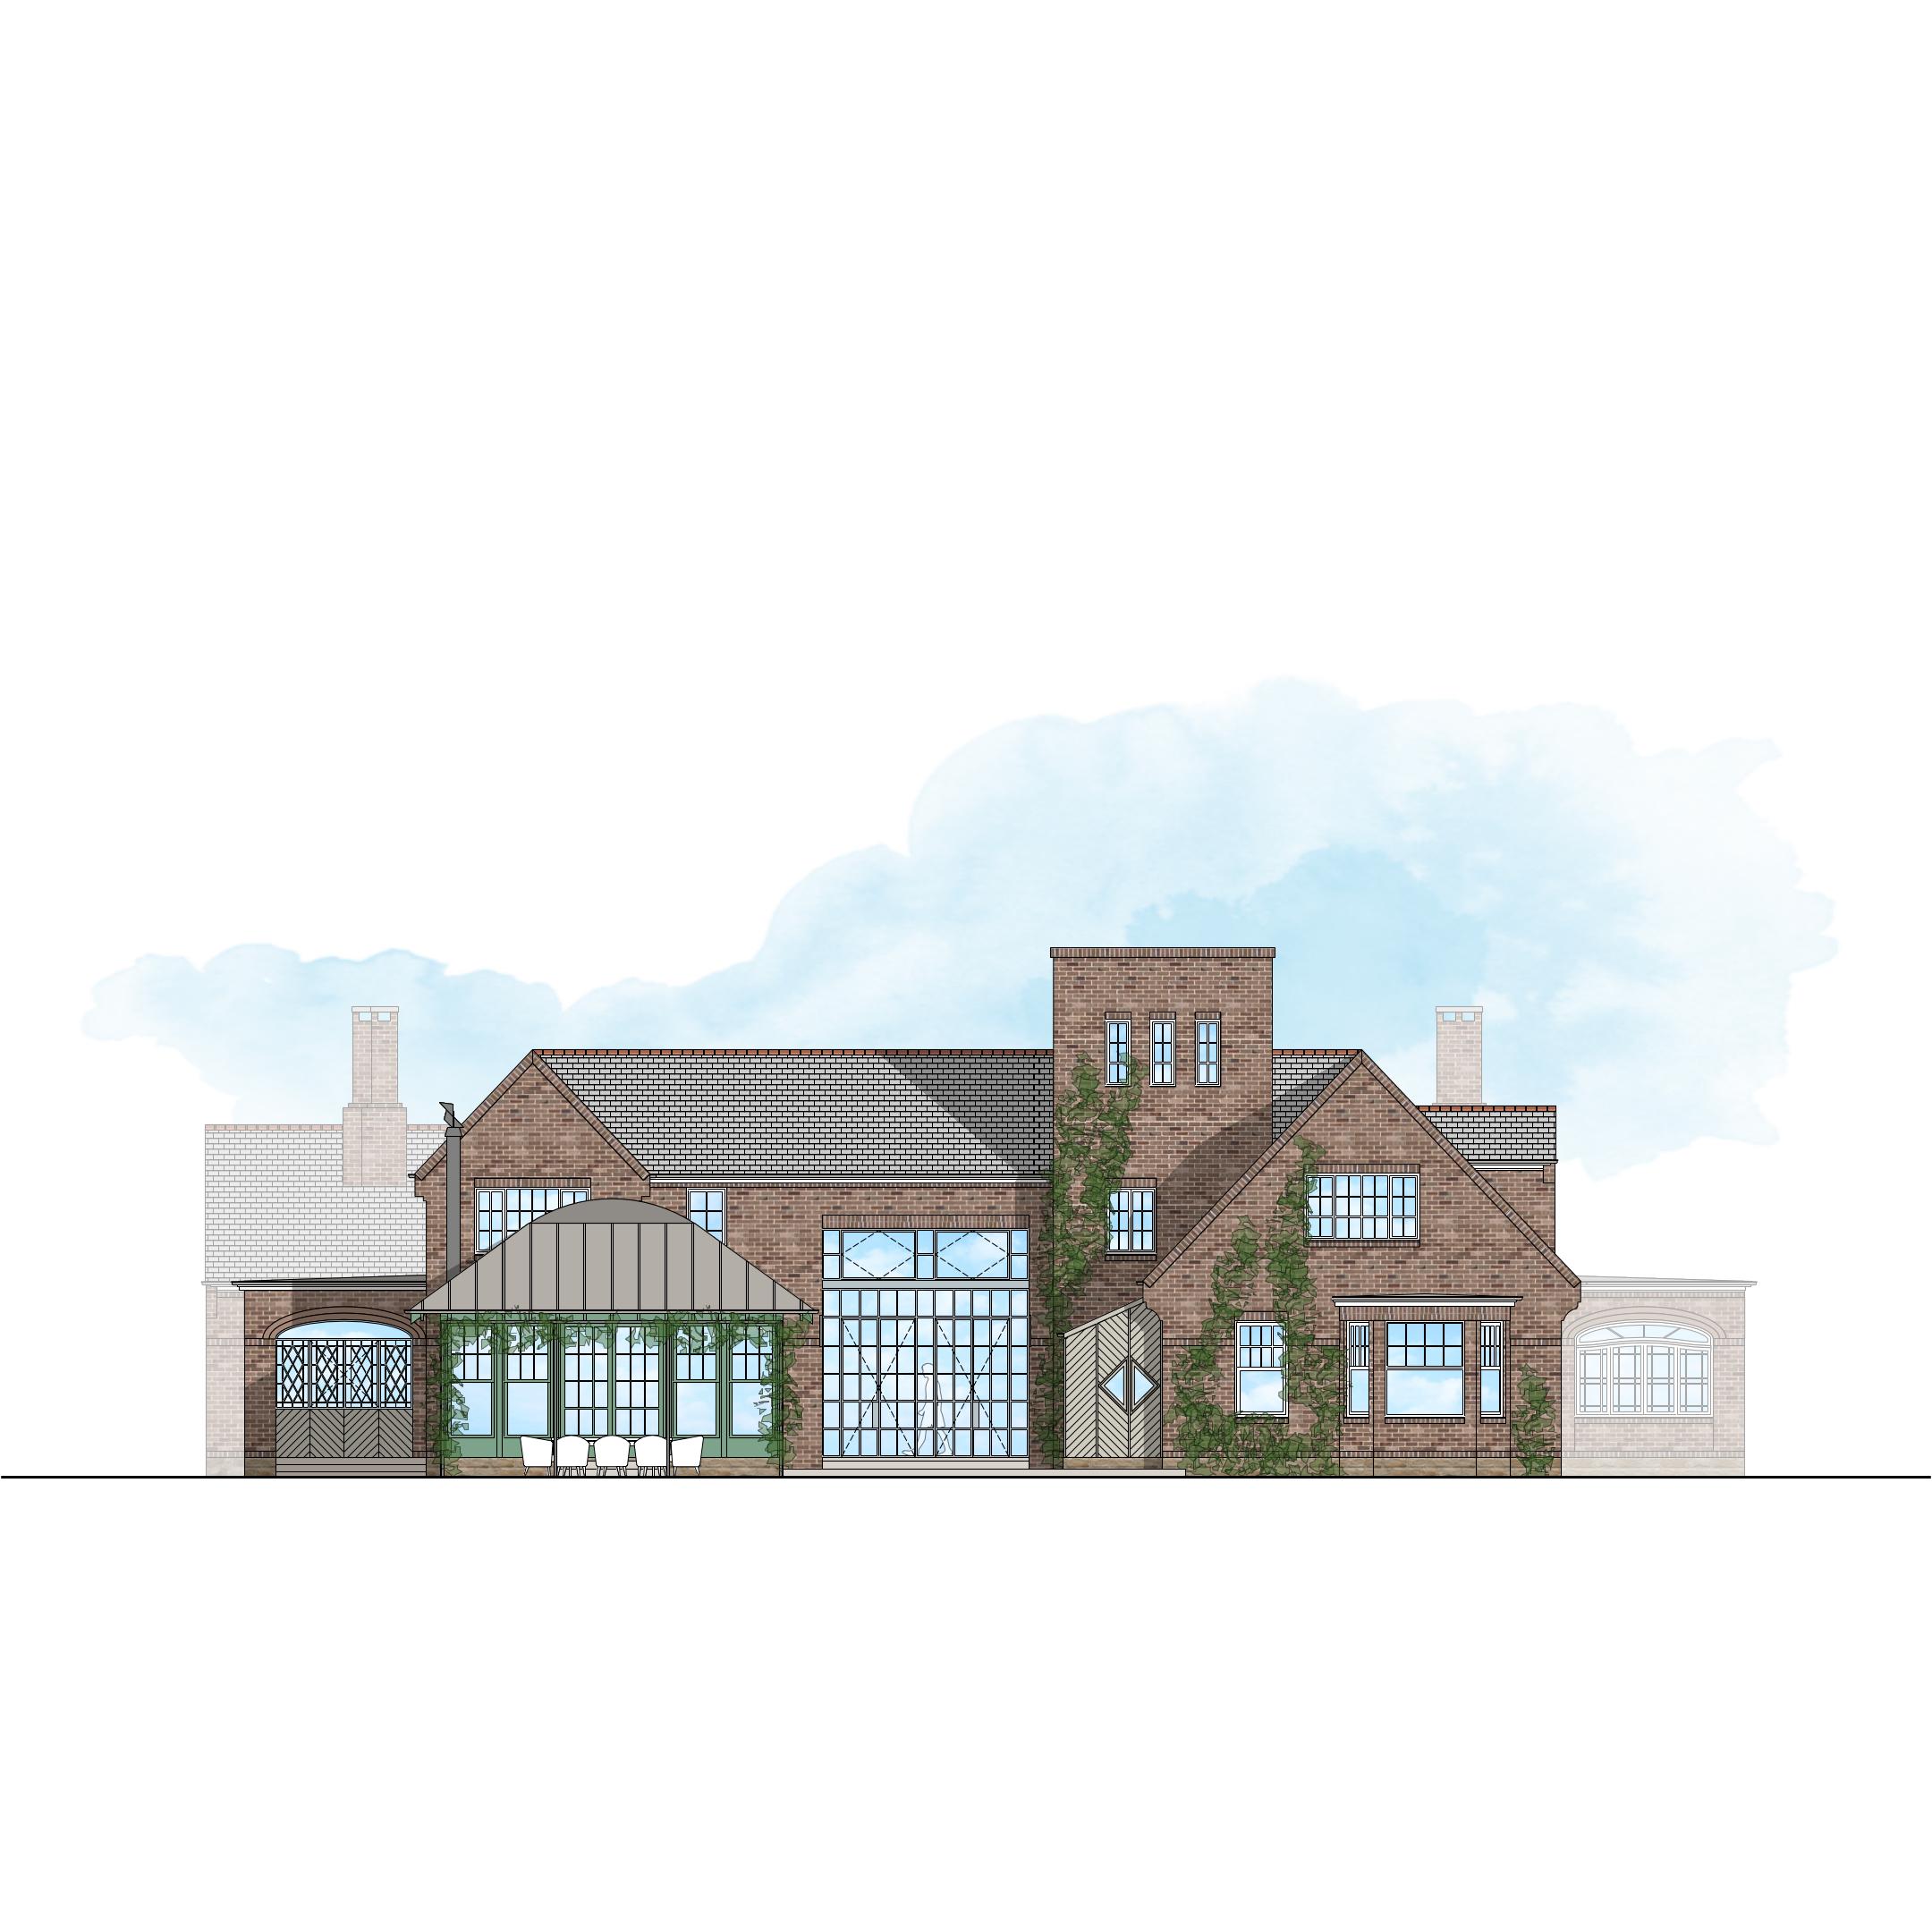 James Allen Architect Grasemere House 3.jpg